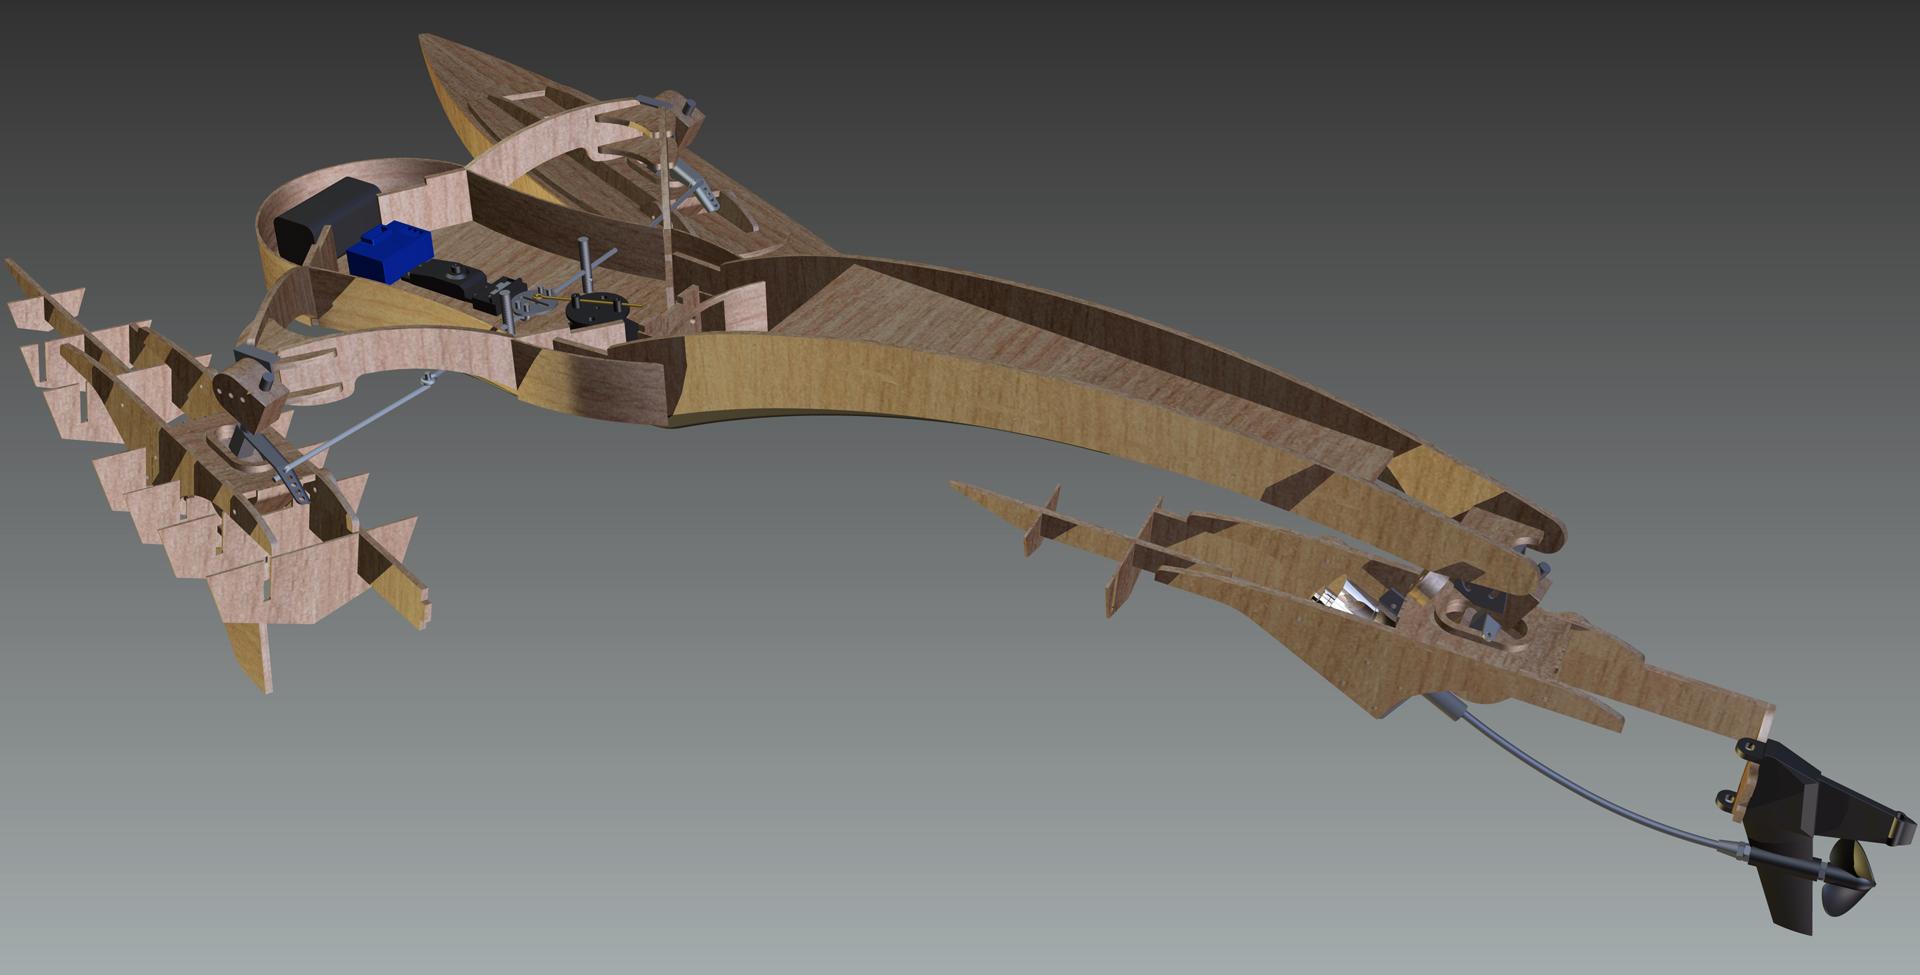 I - triPod RC Model v1 - 02